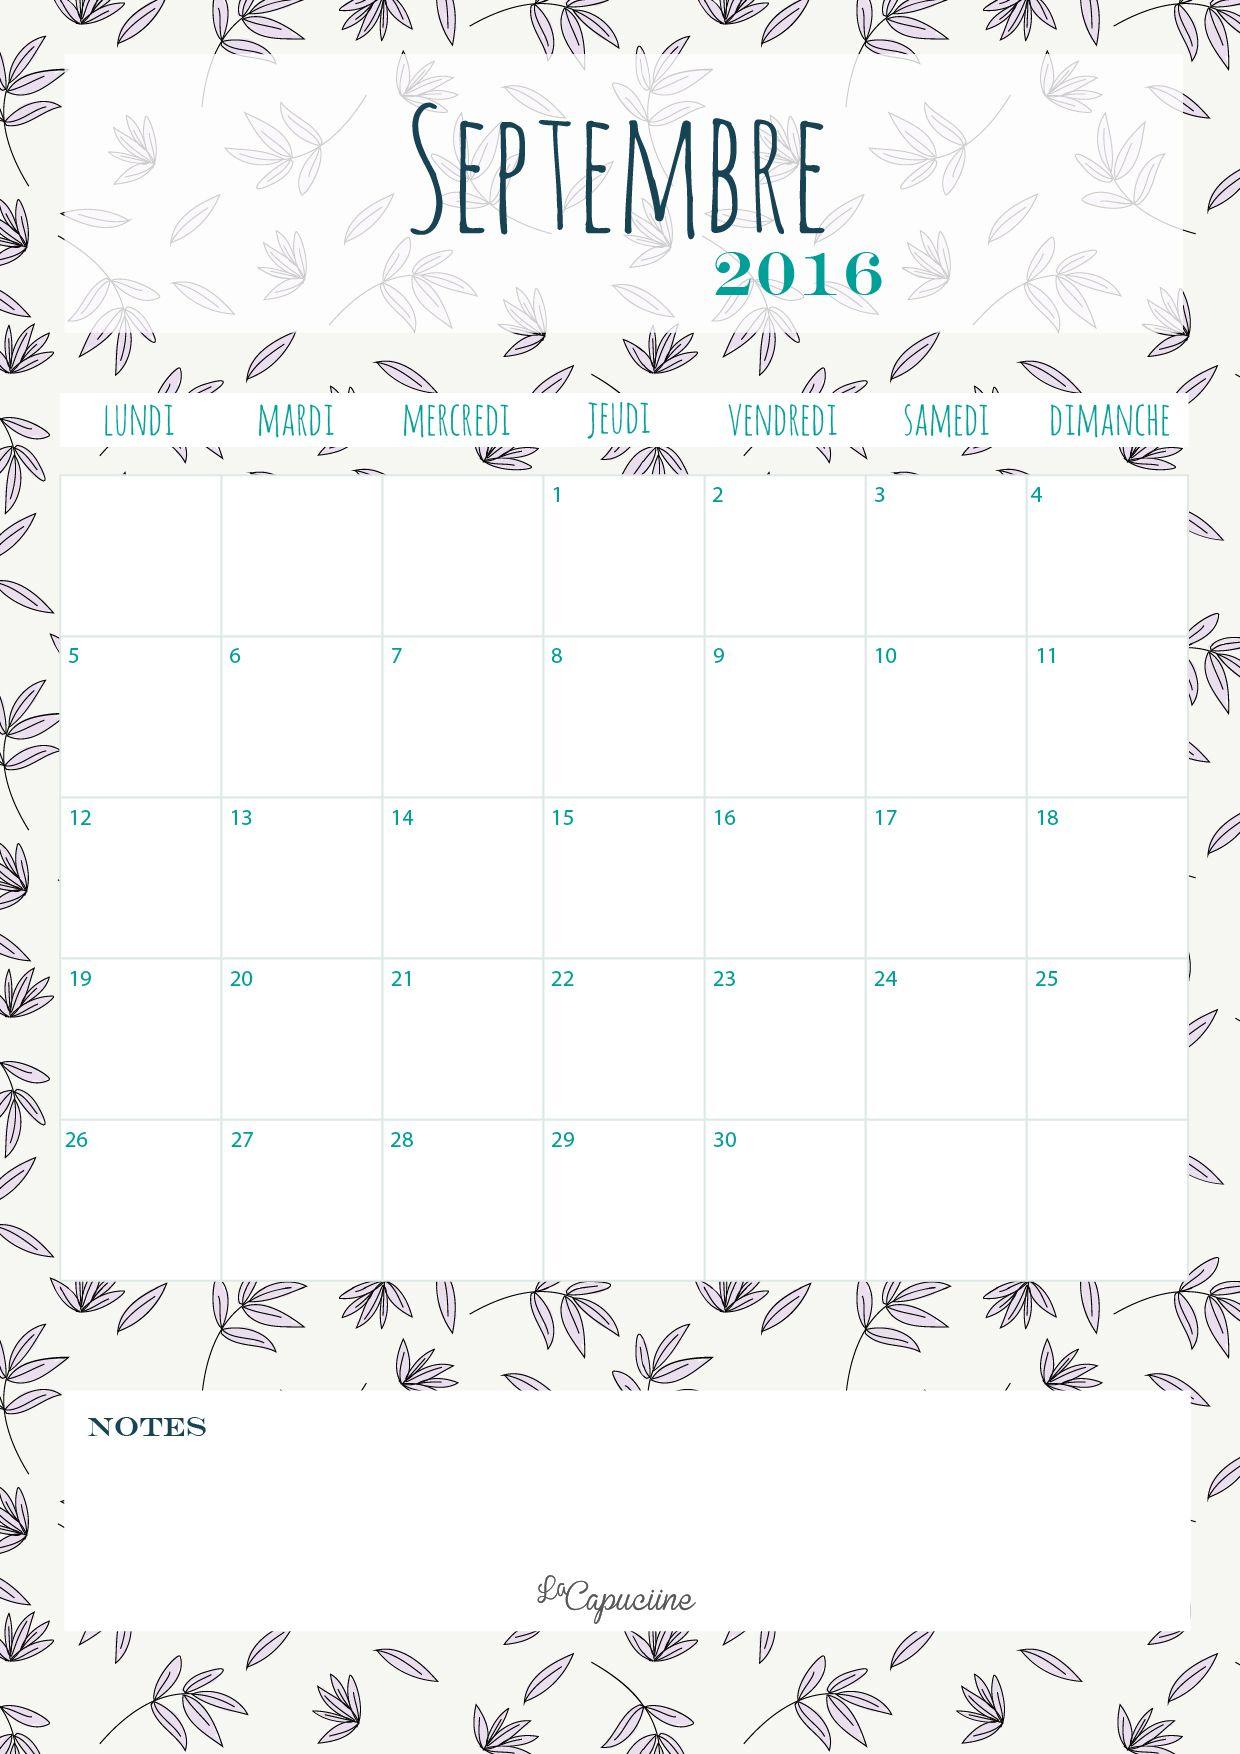 Calendrier septembre 2016 la capuciine pinterest calendrier septembre 2016 - Calendrier lune septembre 2017 ...